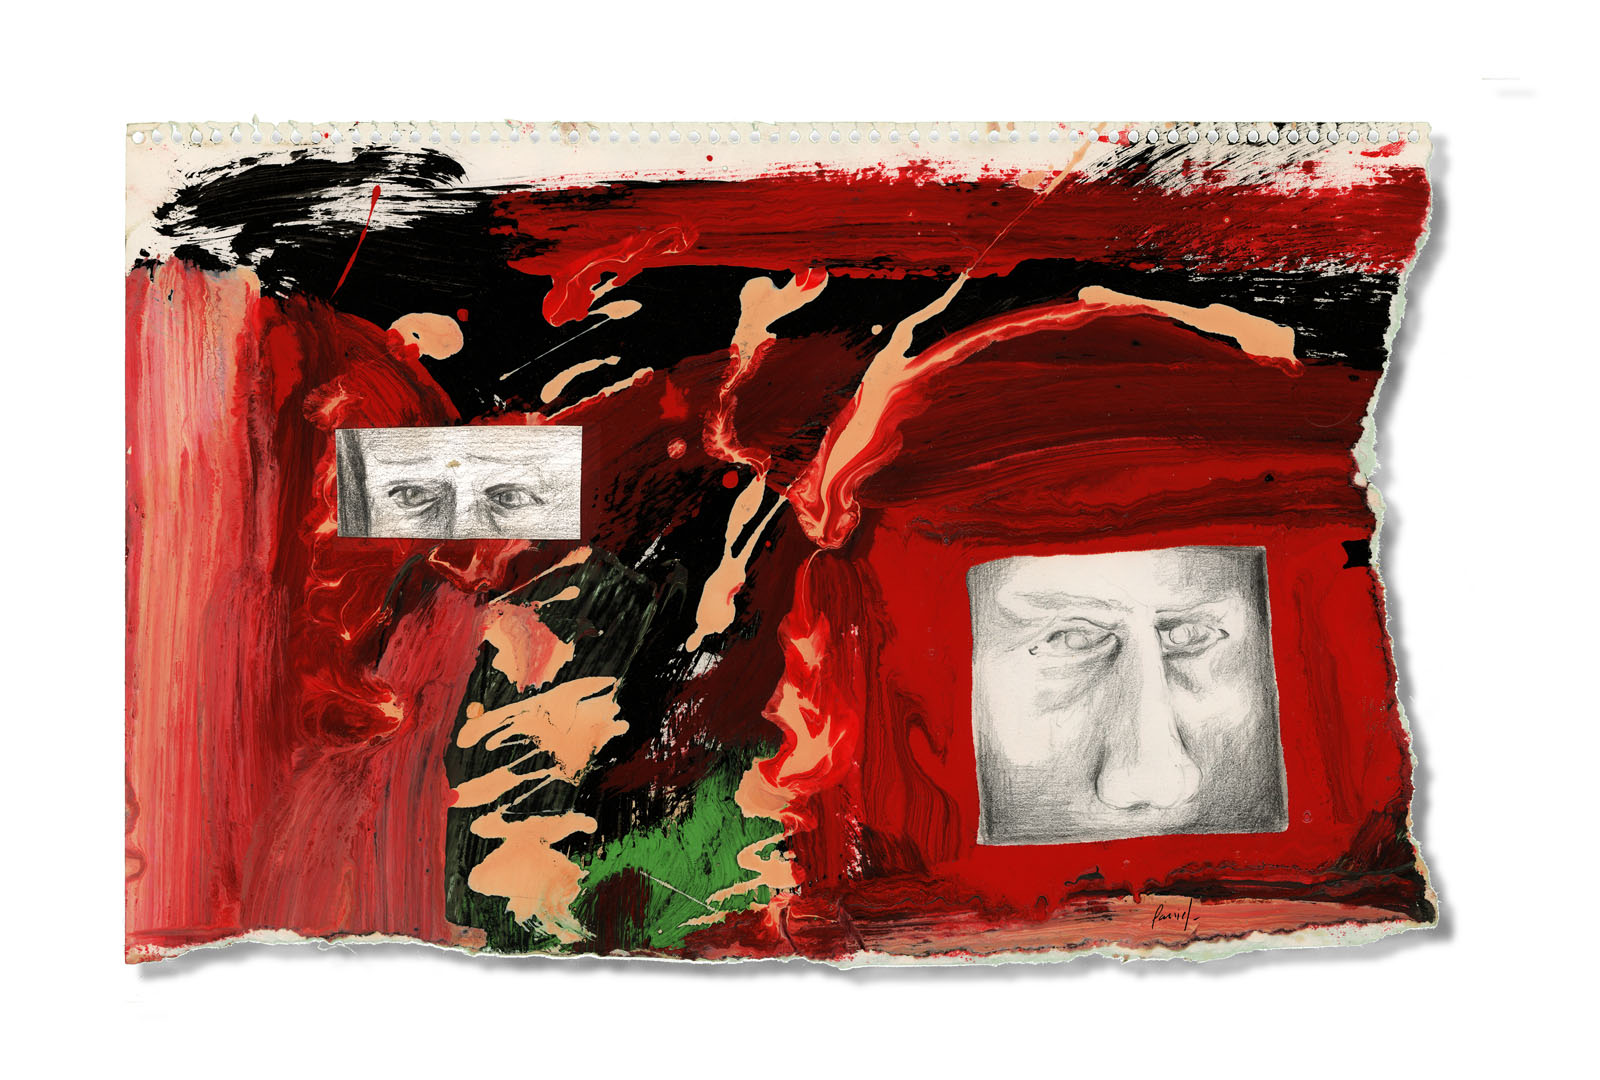 danielvillalobos-spanish-painting-twentiethcentury-cubism-18